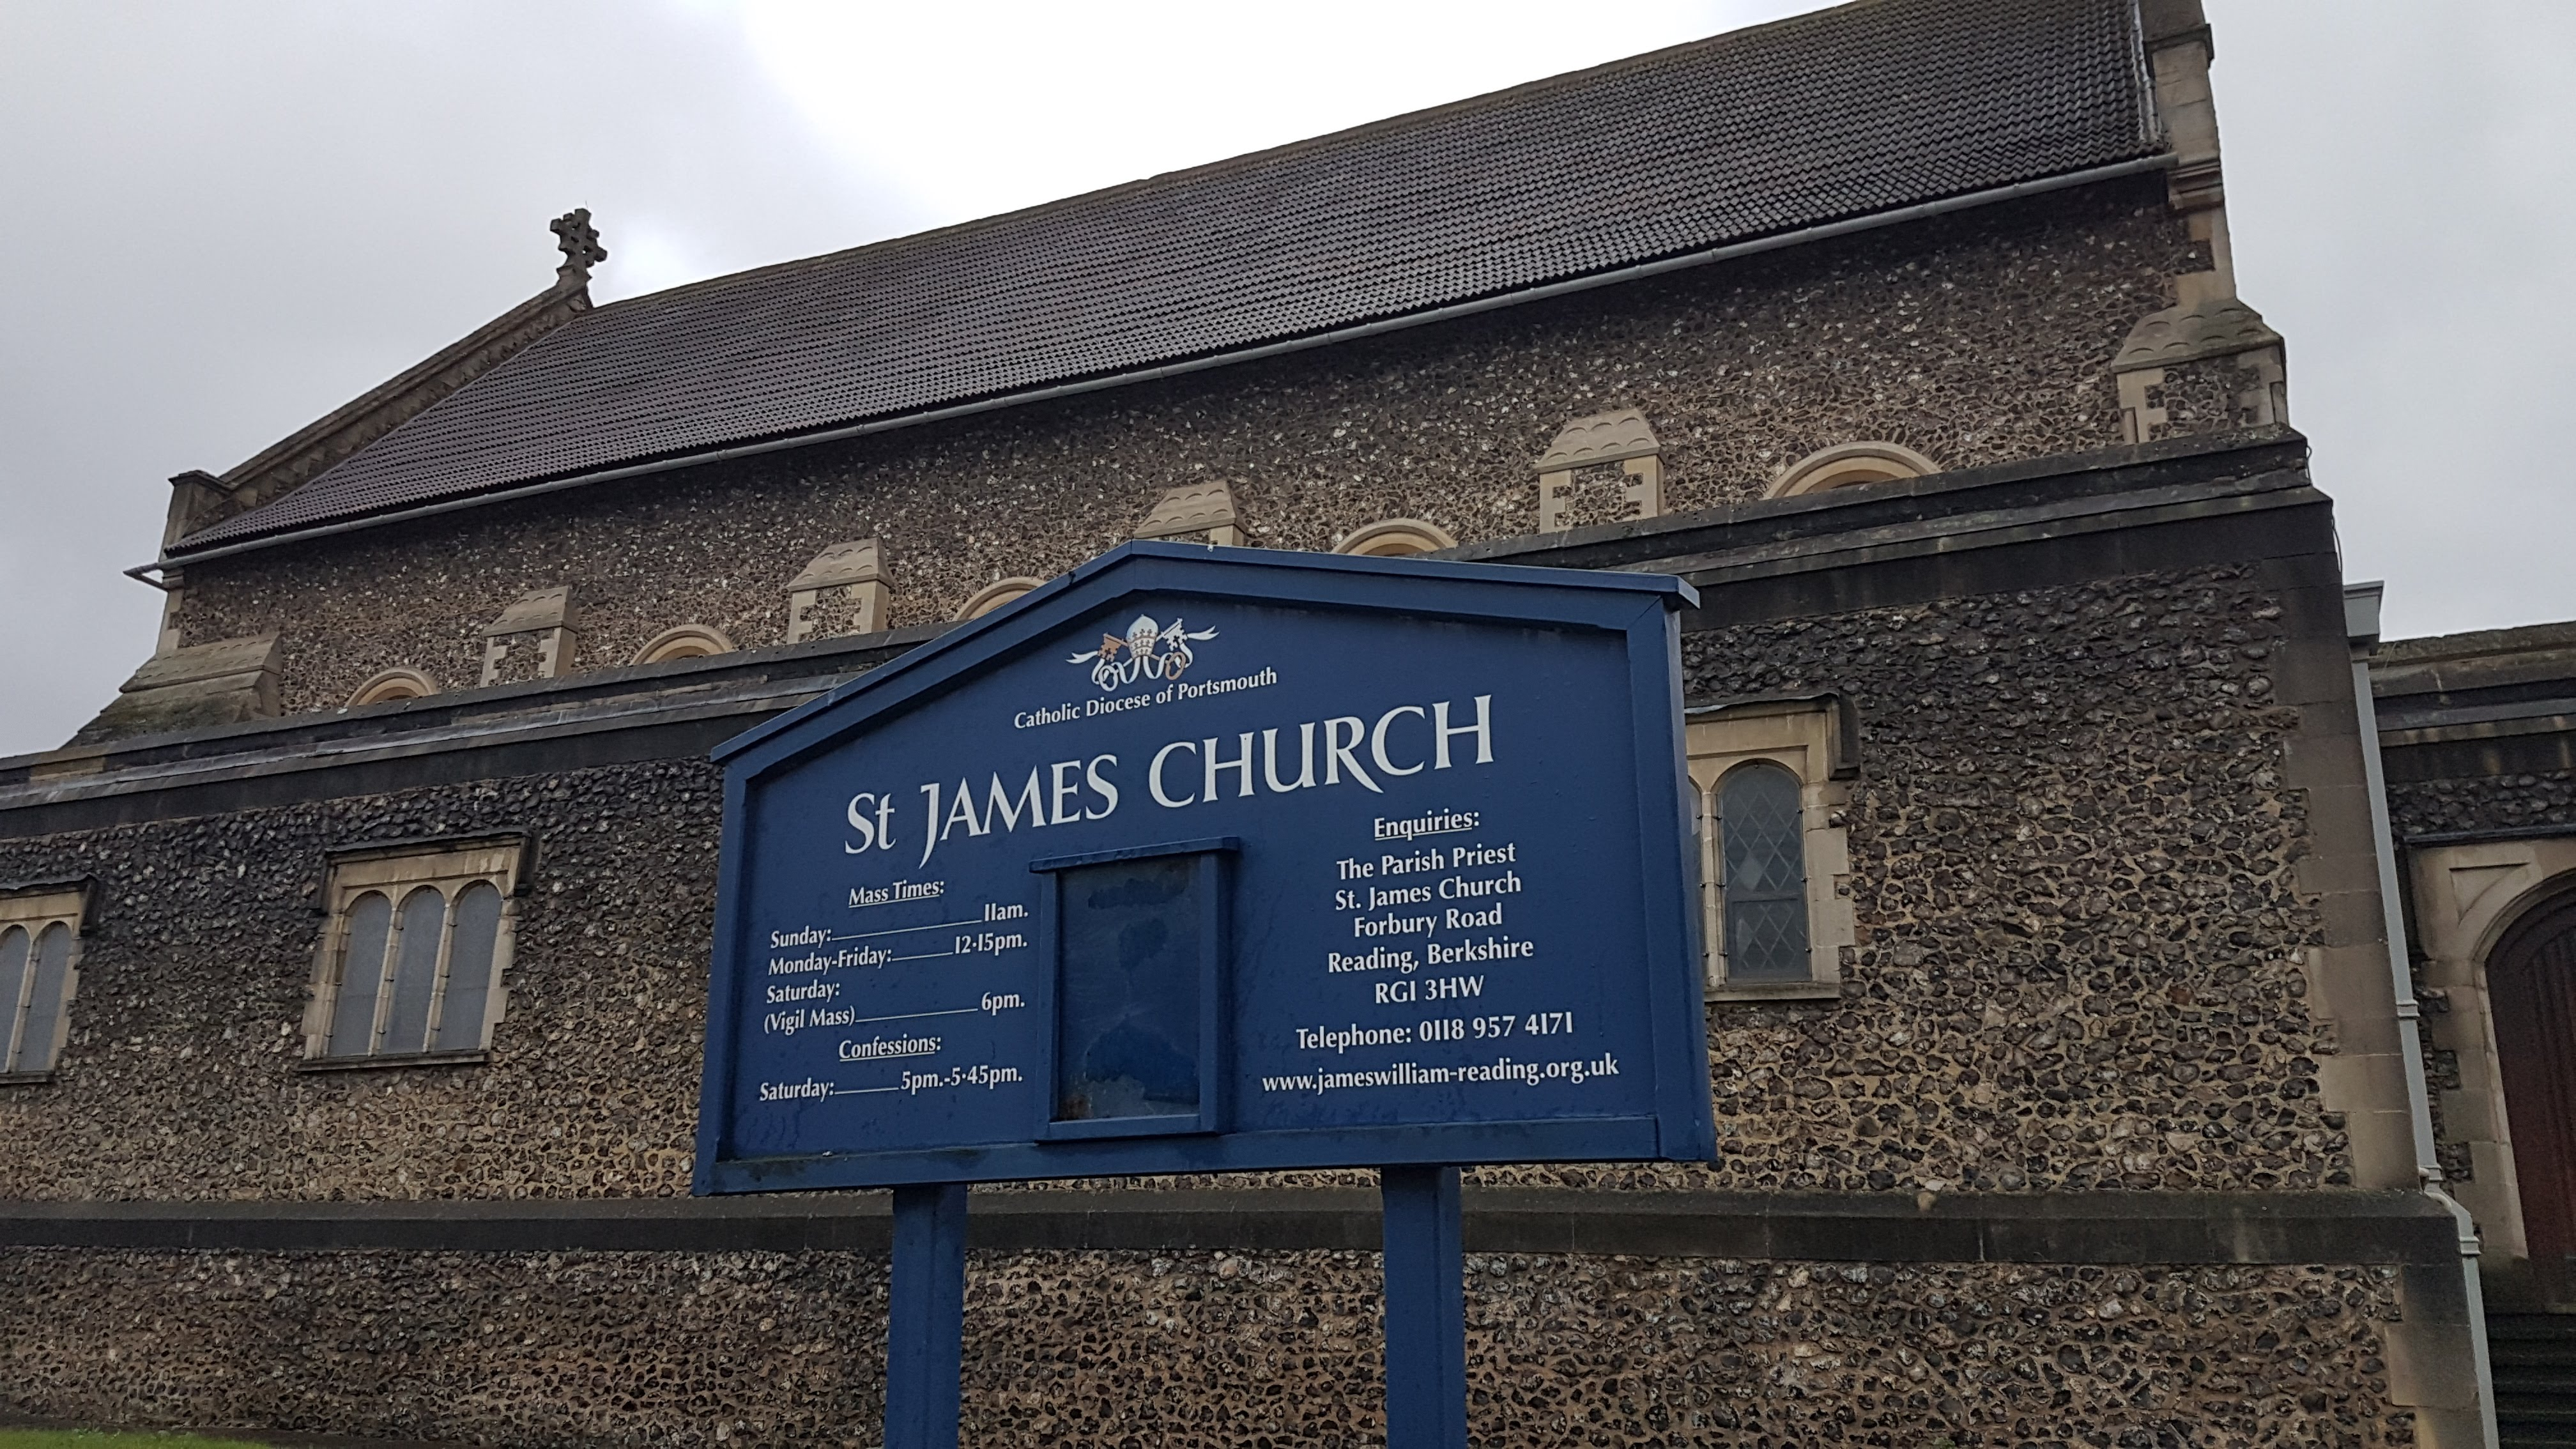 St James Way UK – My Long Walk 2019